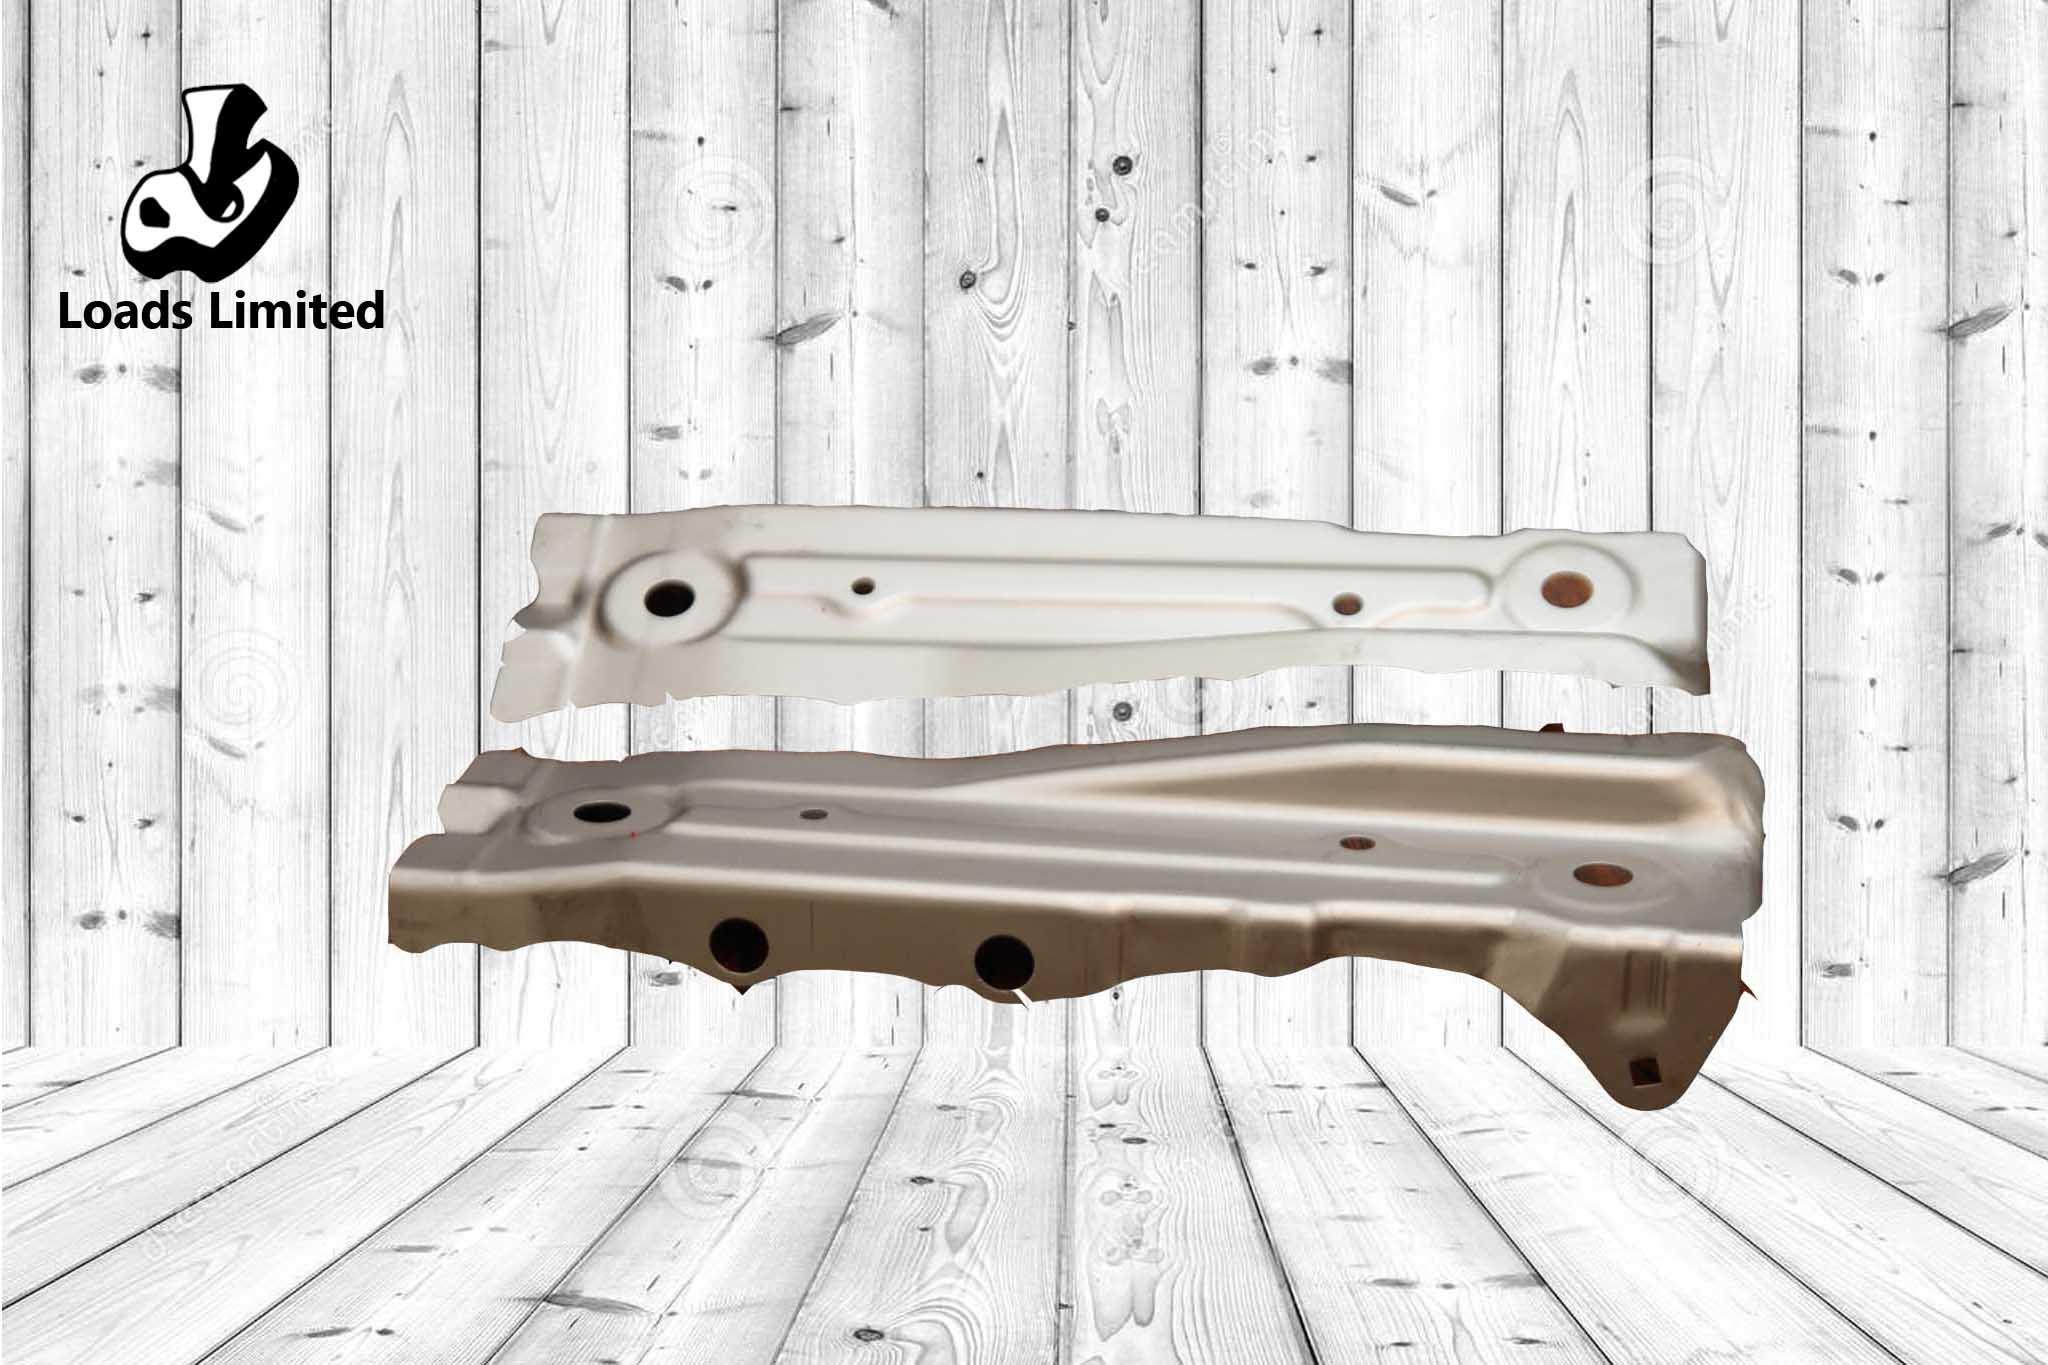 PLATE R/L, FR BHD SIDE STAY Size: JSC270C 0.6mm